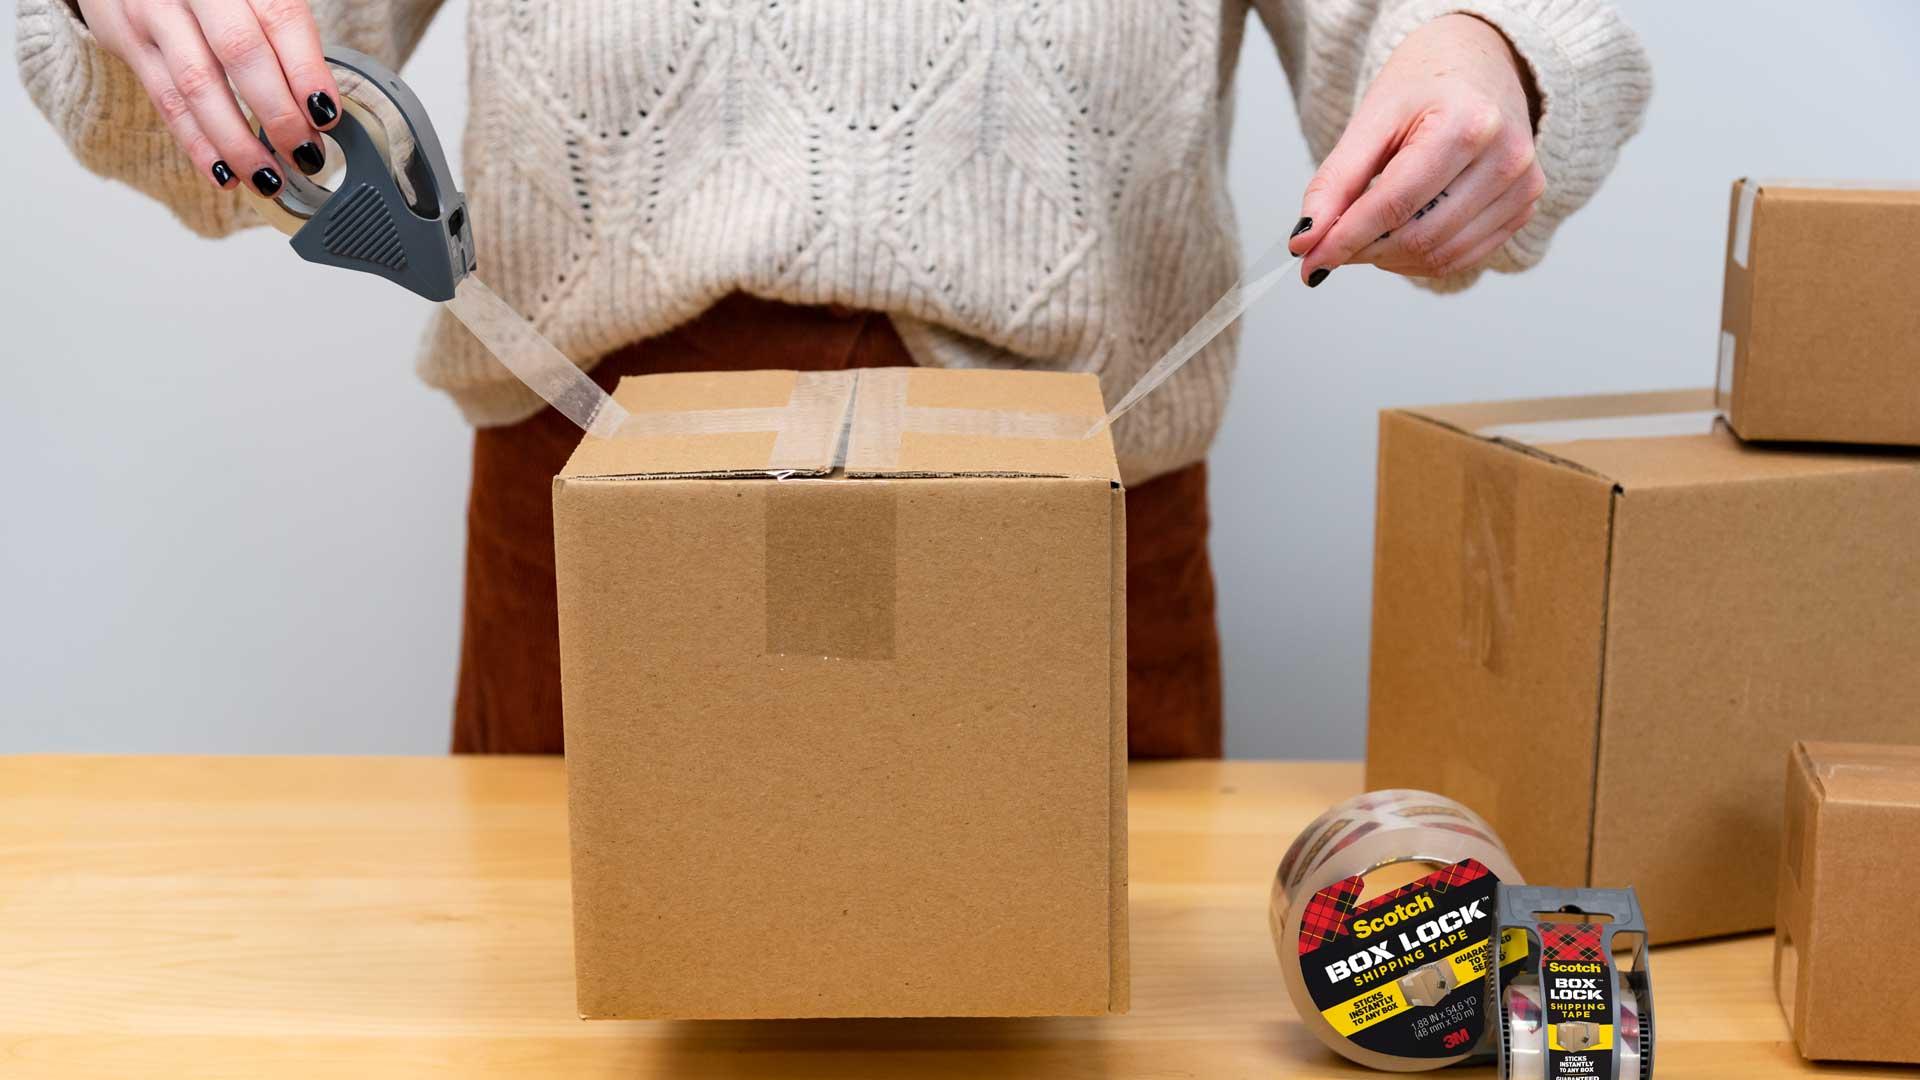 Woman wraps cardboard moving box with Scotch Box Lock shipping tape.